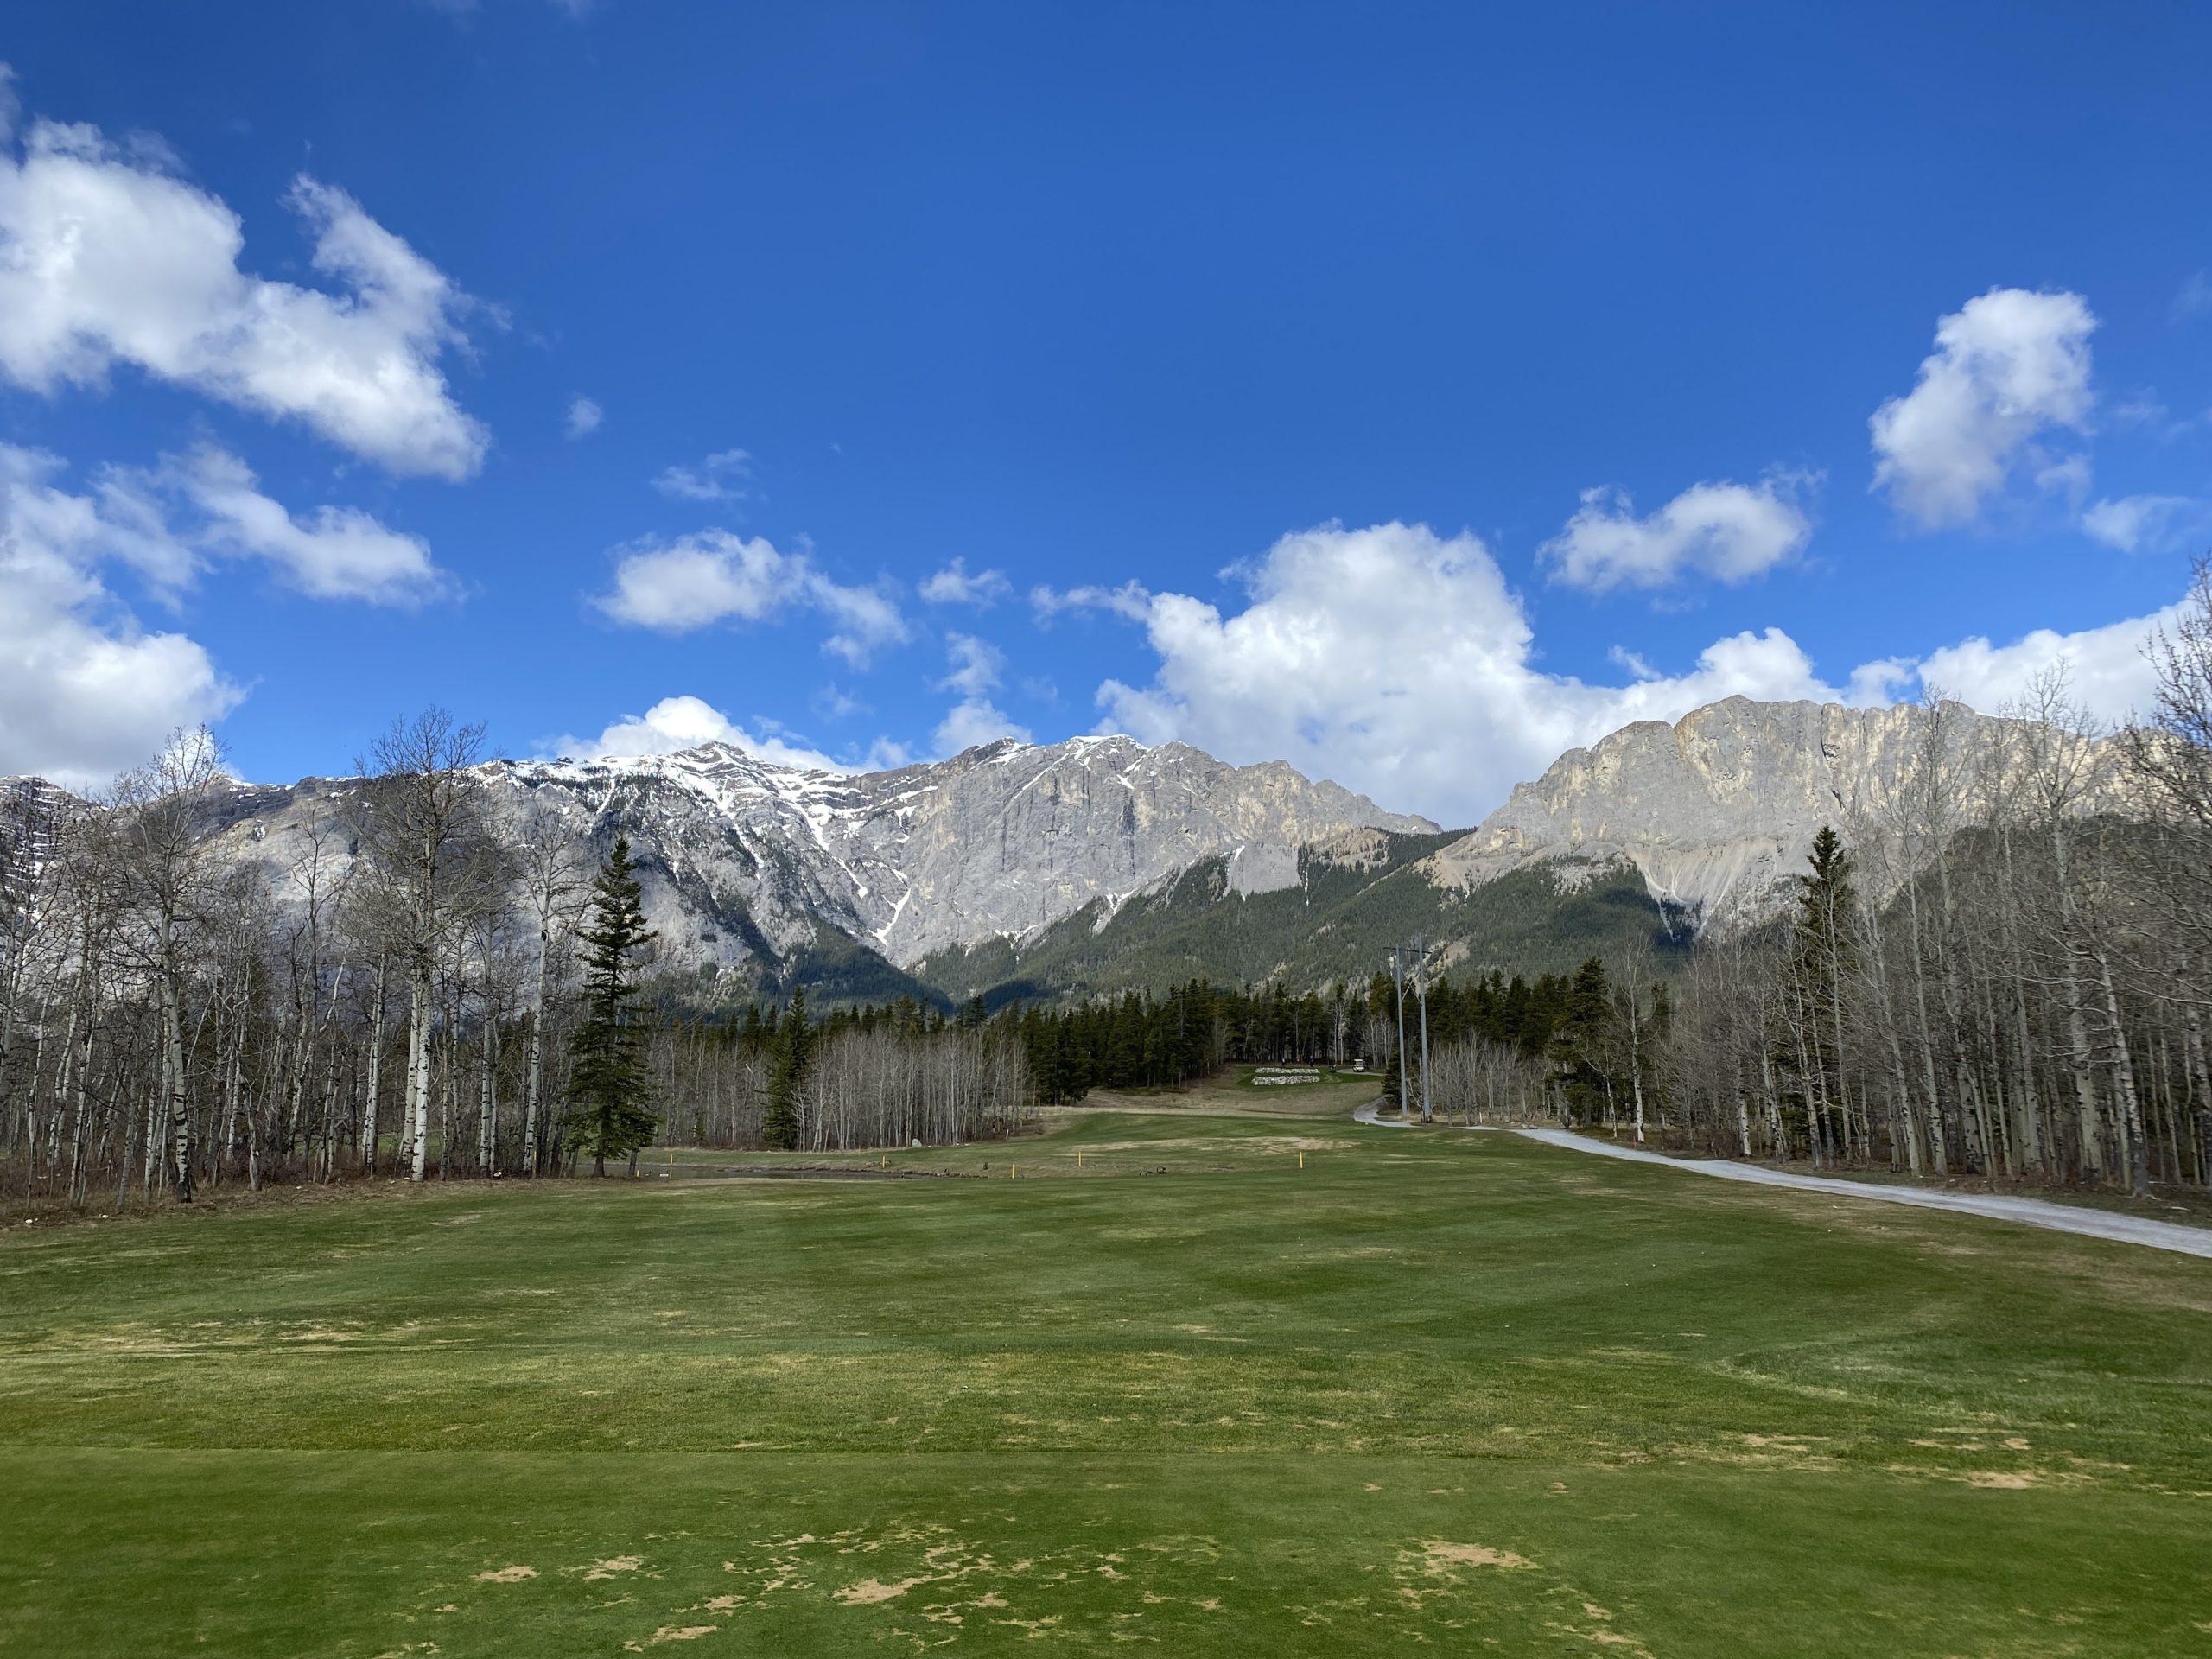 brewsters kananaskis ranch golf with Mount Yamnuska